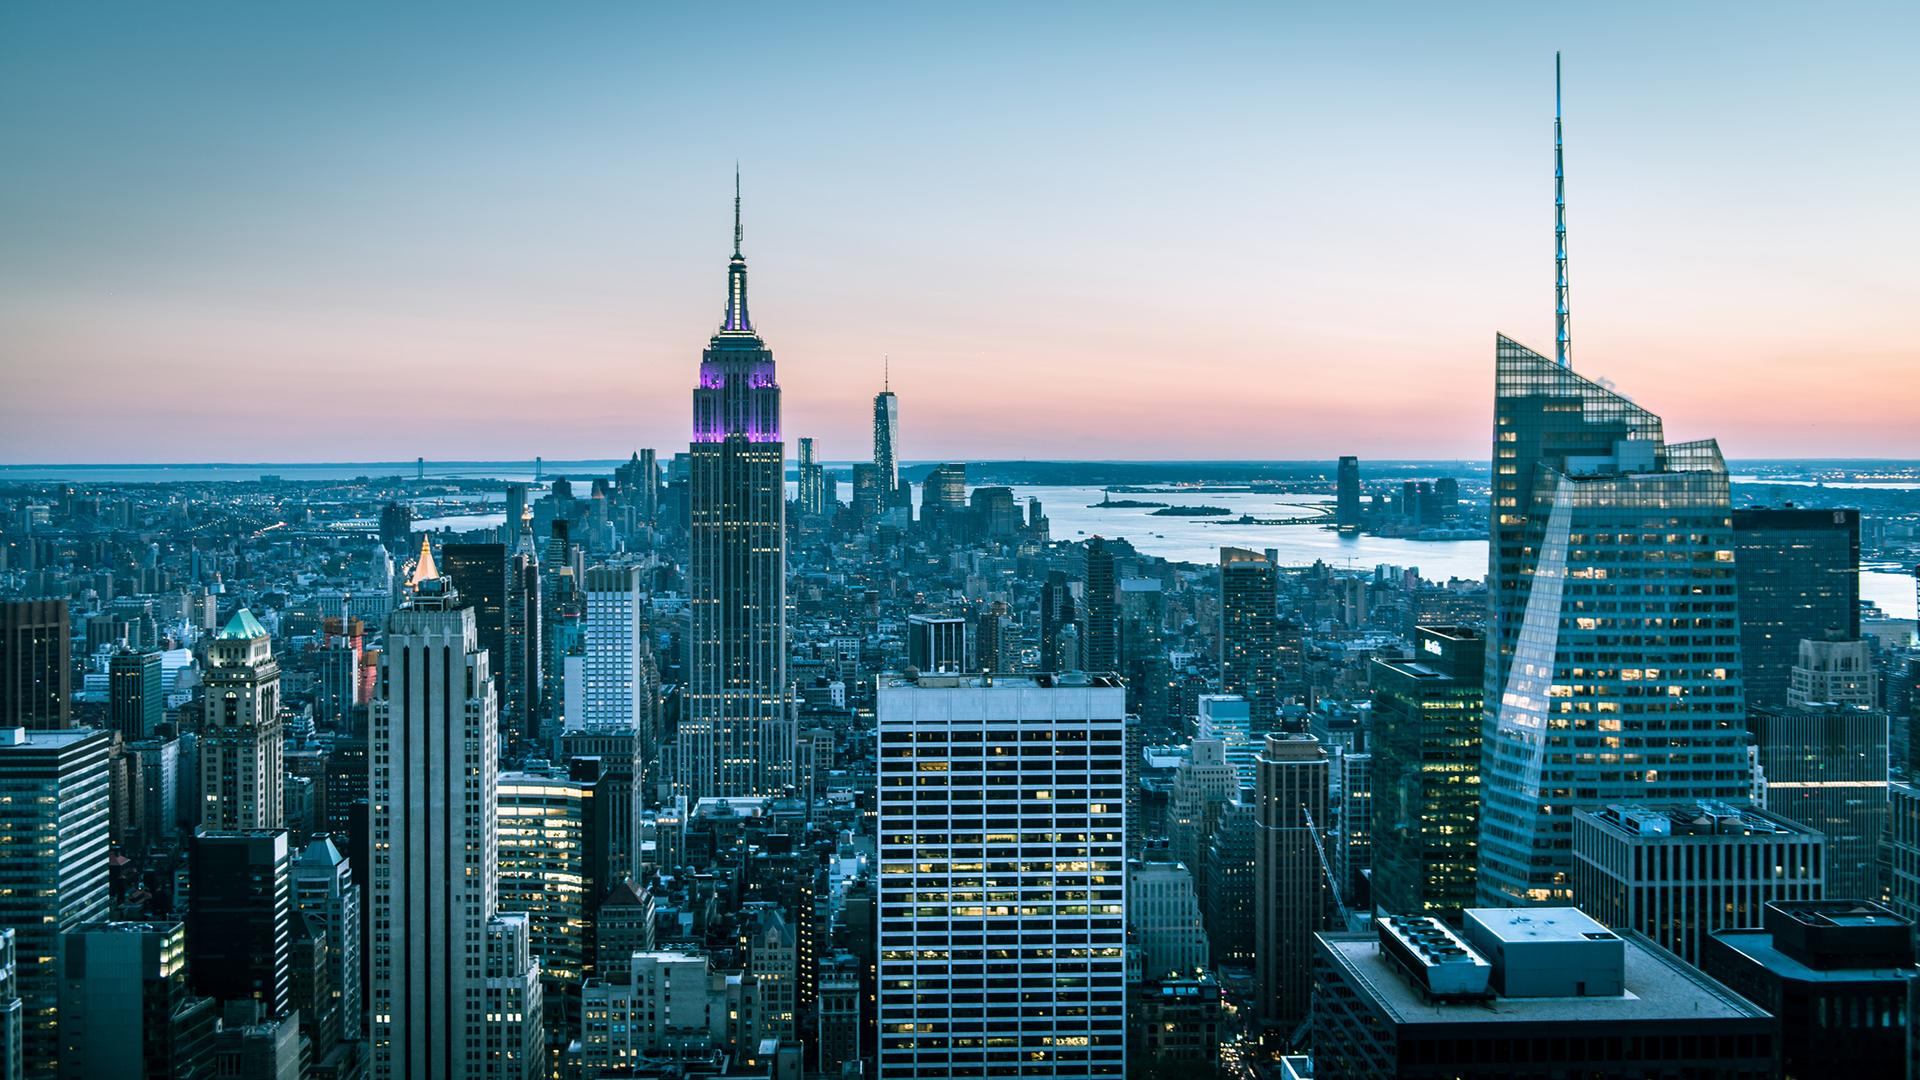 download New York Buildings Skyscrapers wallpaper background 1920x1080